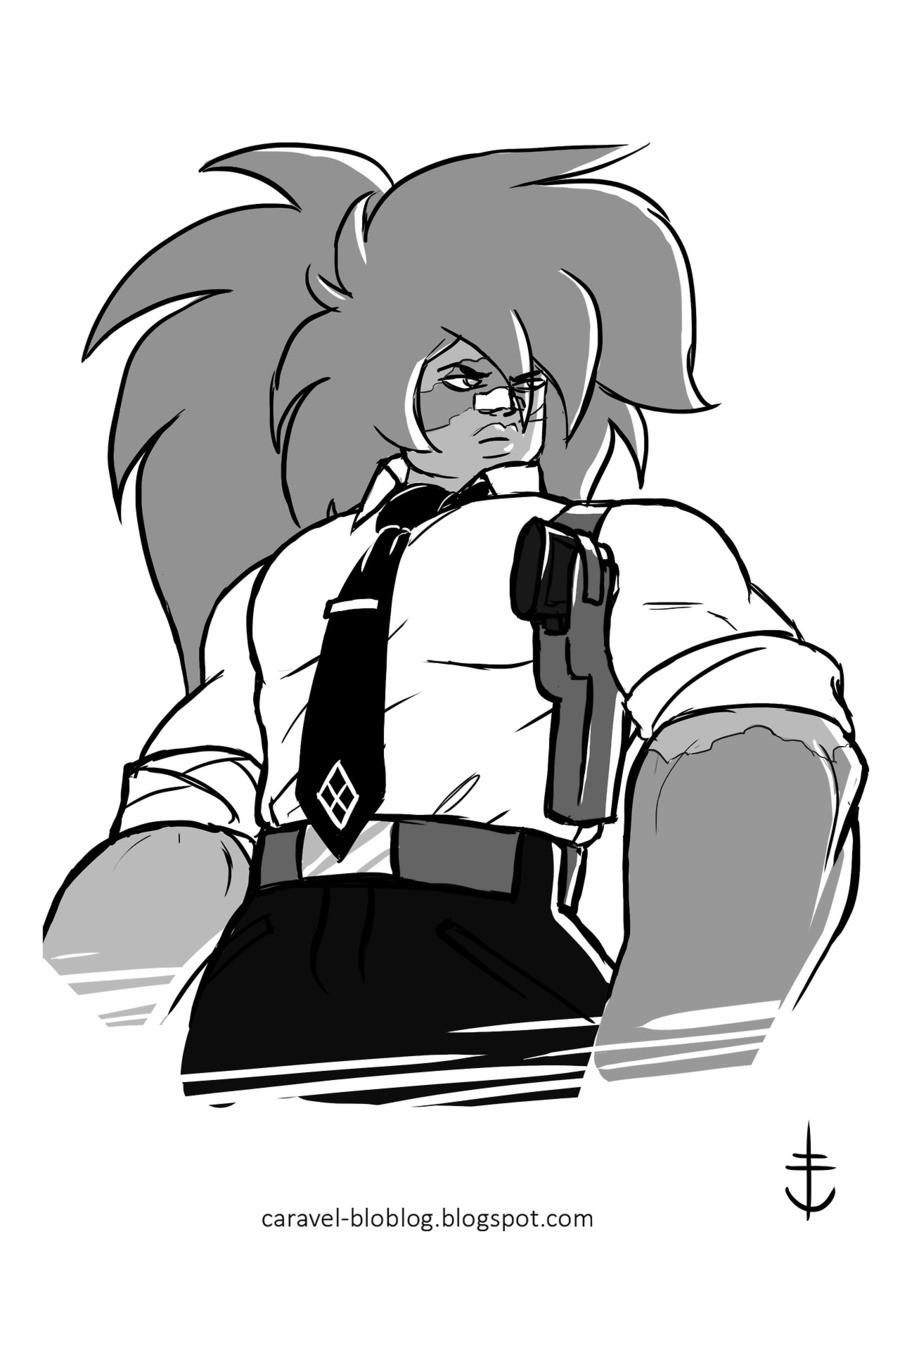 Ancient Bodyguard of Pink D. https://tmblr.co/mXelFST93rJIPeZaEG07lSA Jasper : Would kick anyone's butt anytime. Ancient bodyguard of Pink D, witnessed her murd